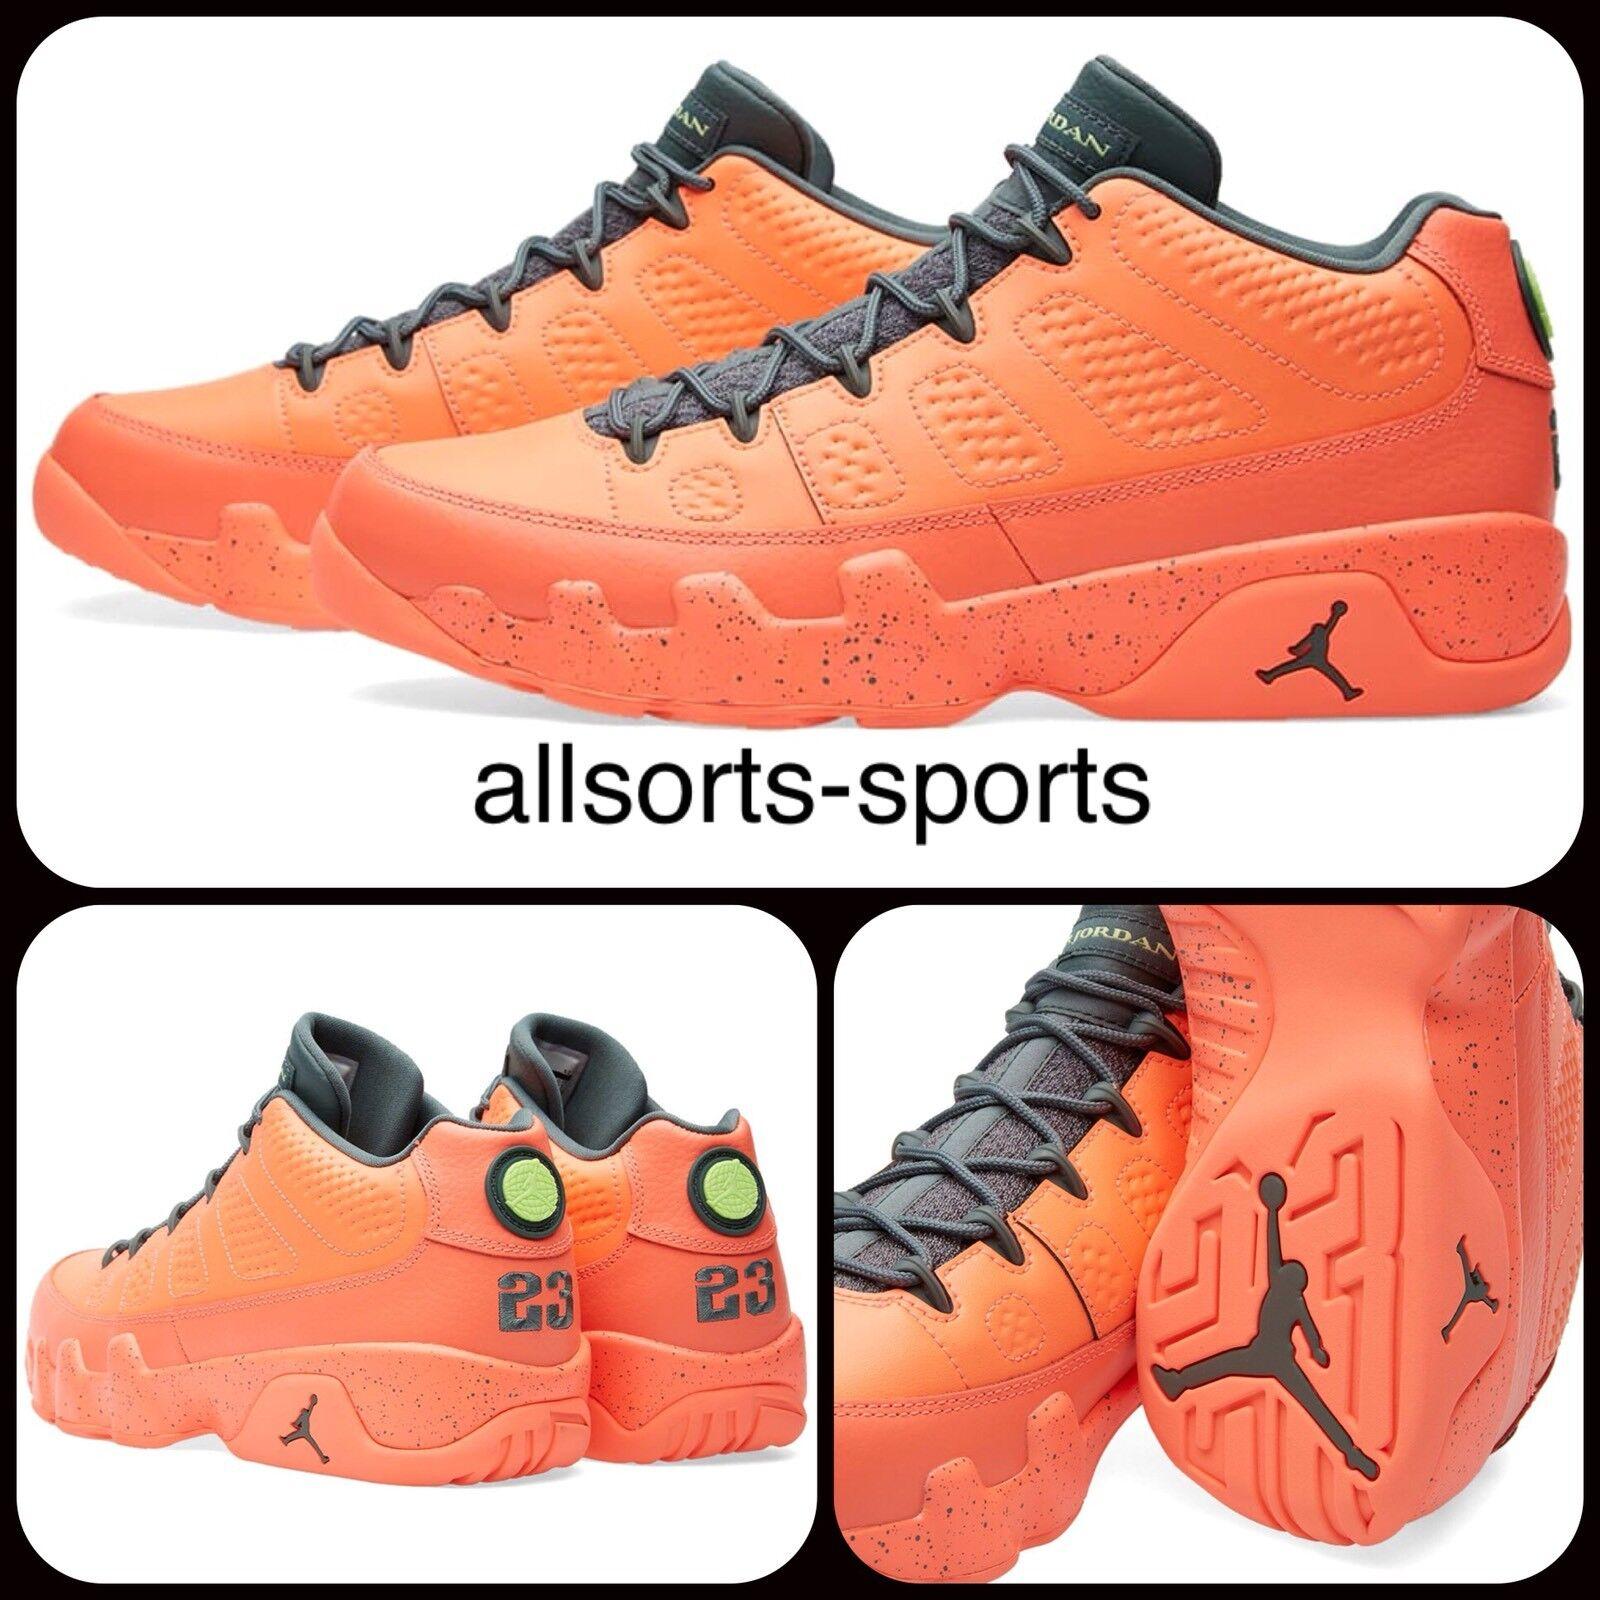 Nike Air Jordan 9 Retro Low 'Bright Mango'7.5, 9, 10 832822-805 BNIB